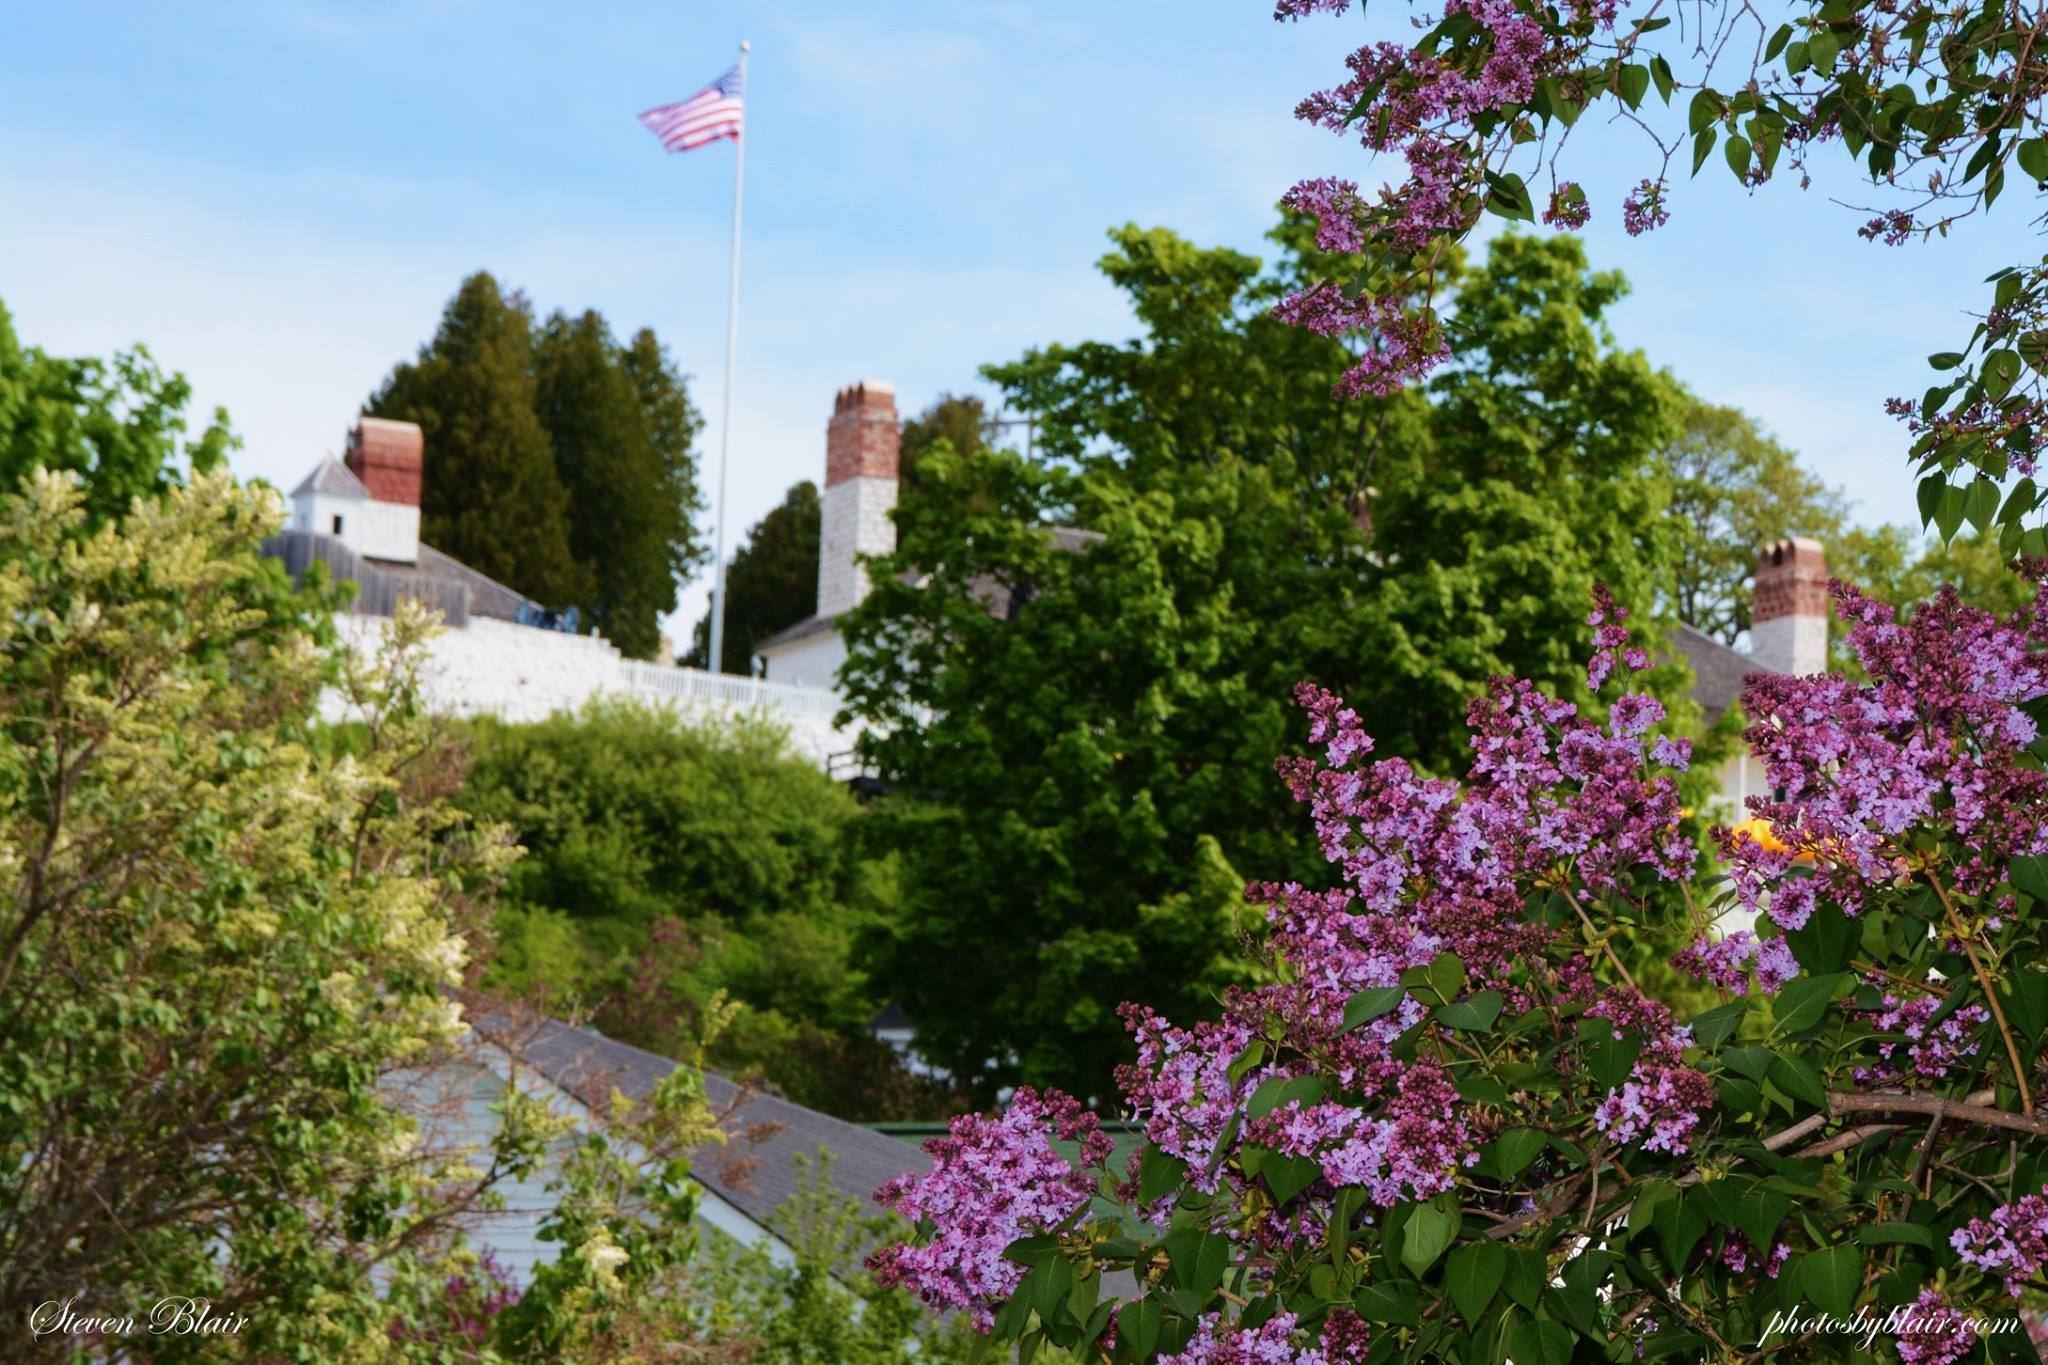 Mackinac Island Lilacs and Lilac Festival